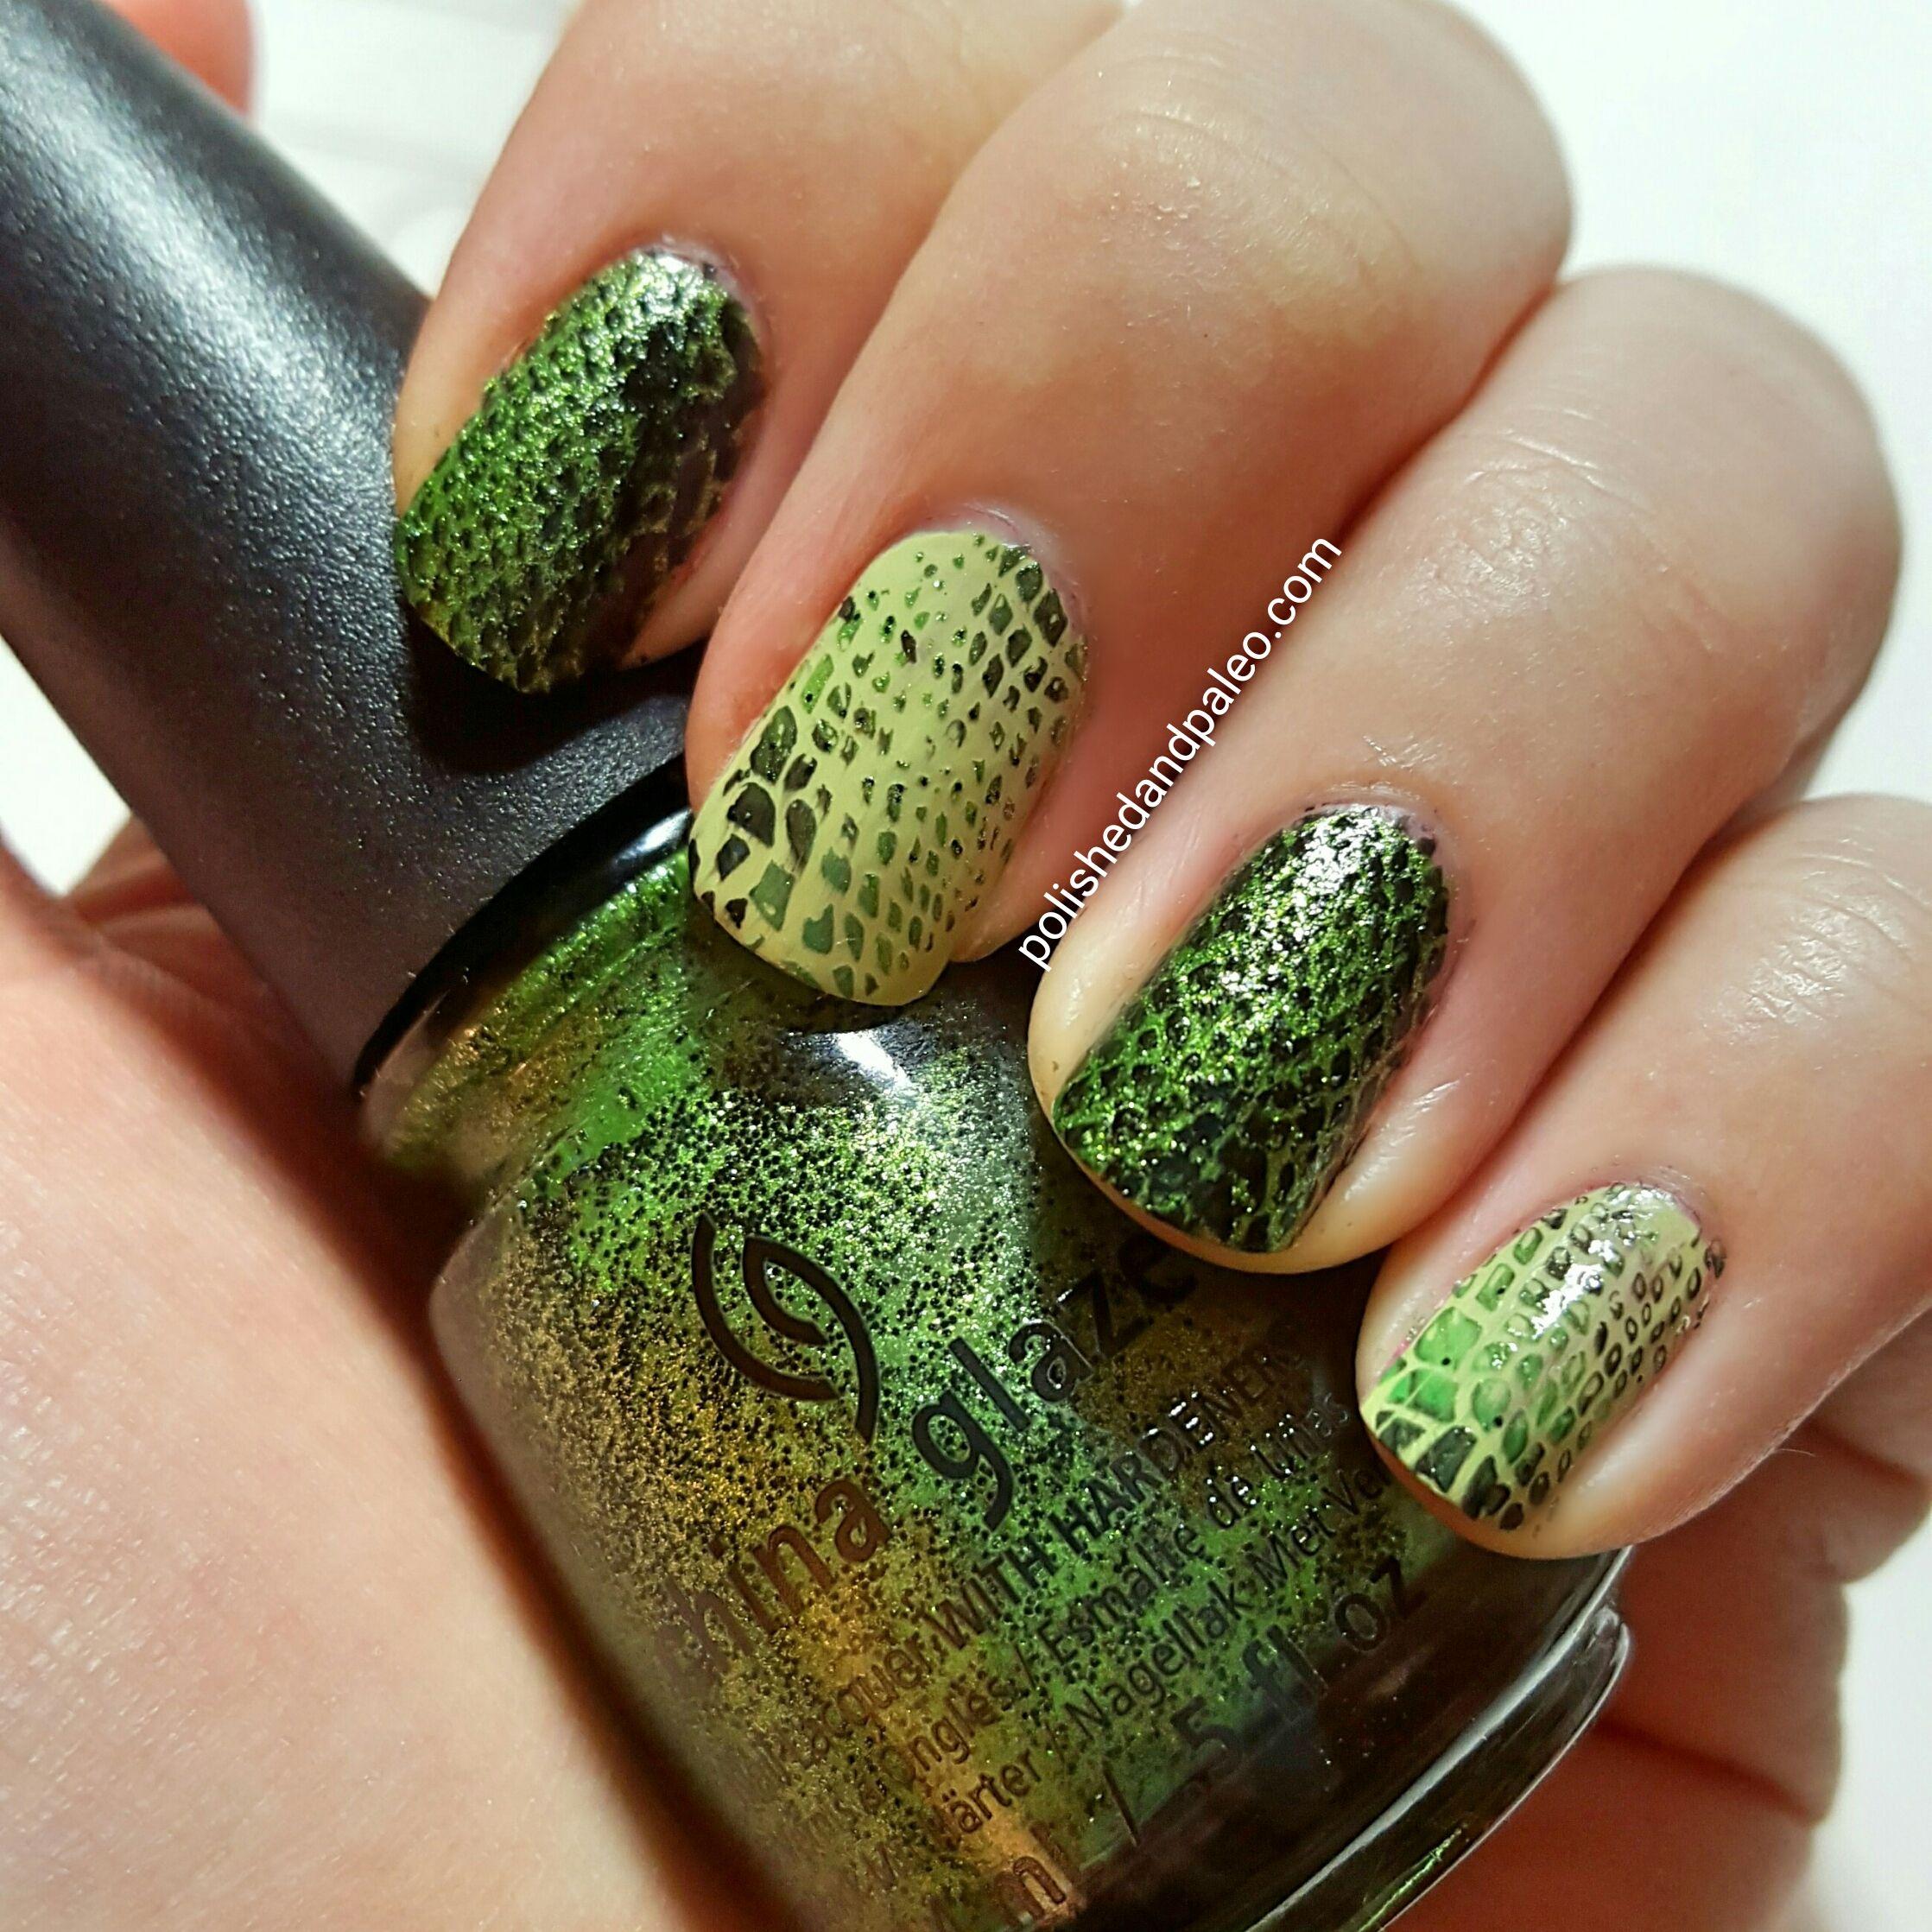 Dinosaur Nail Art | Nail Art Community Pins | Pinterest | Animal ...